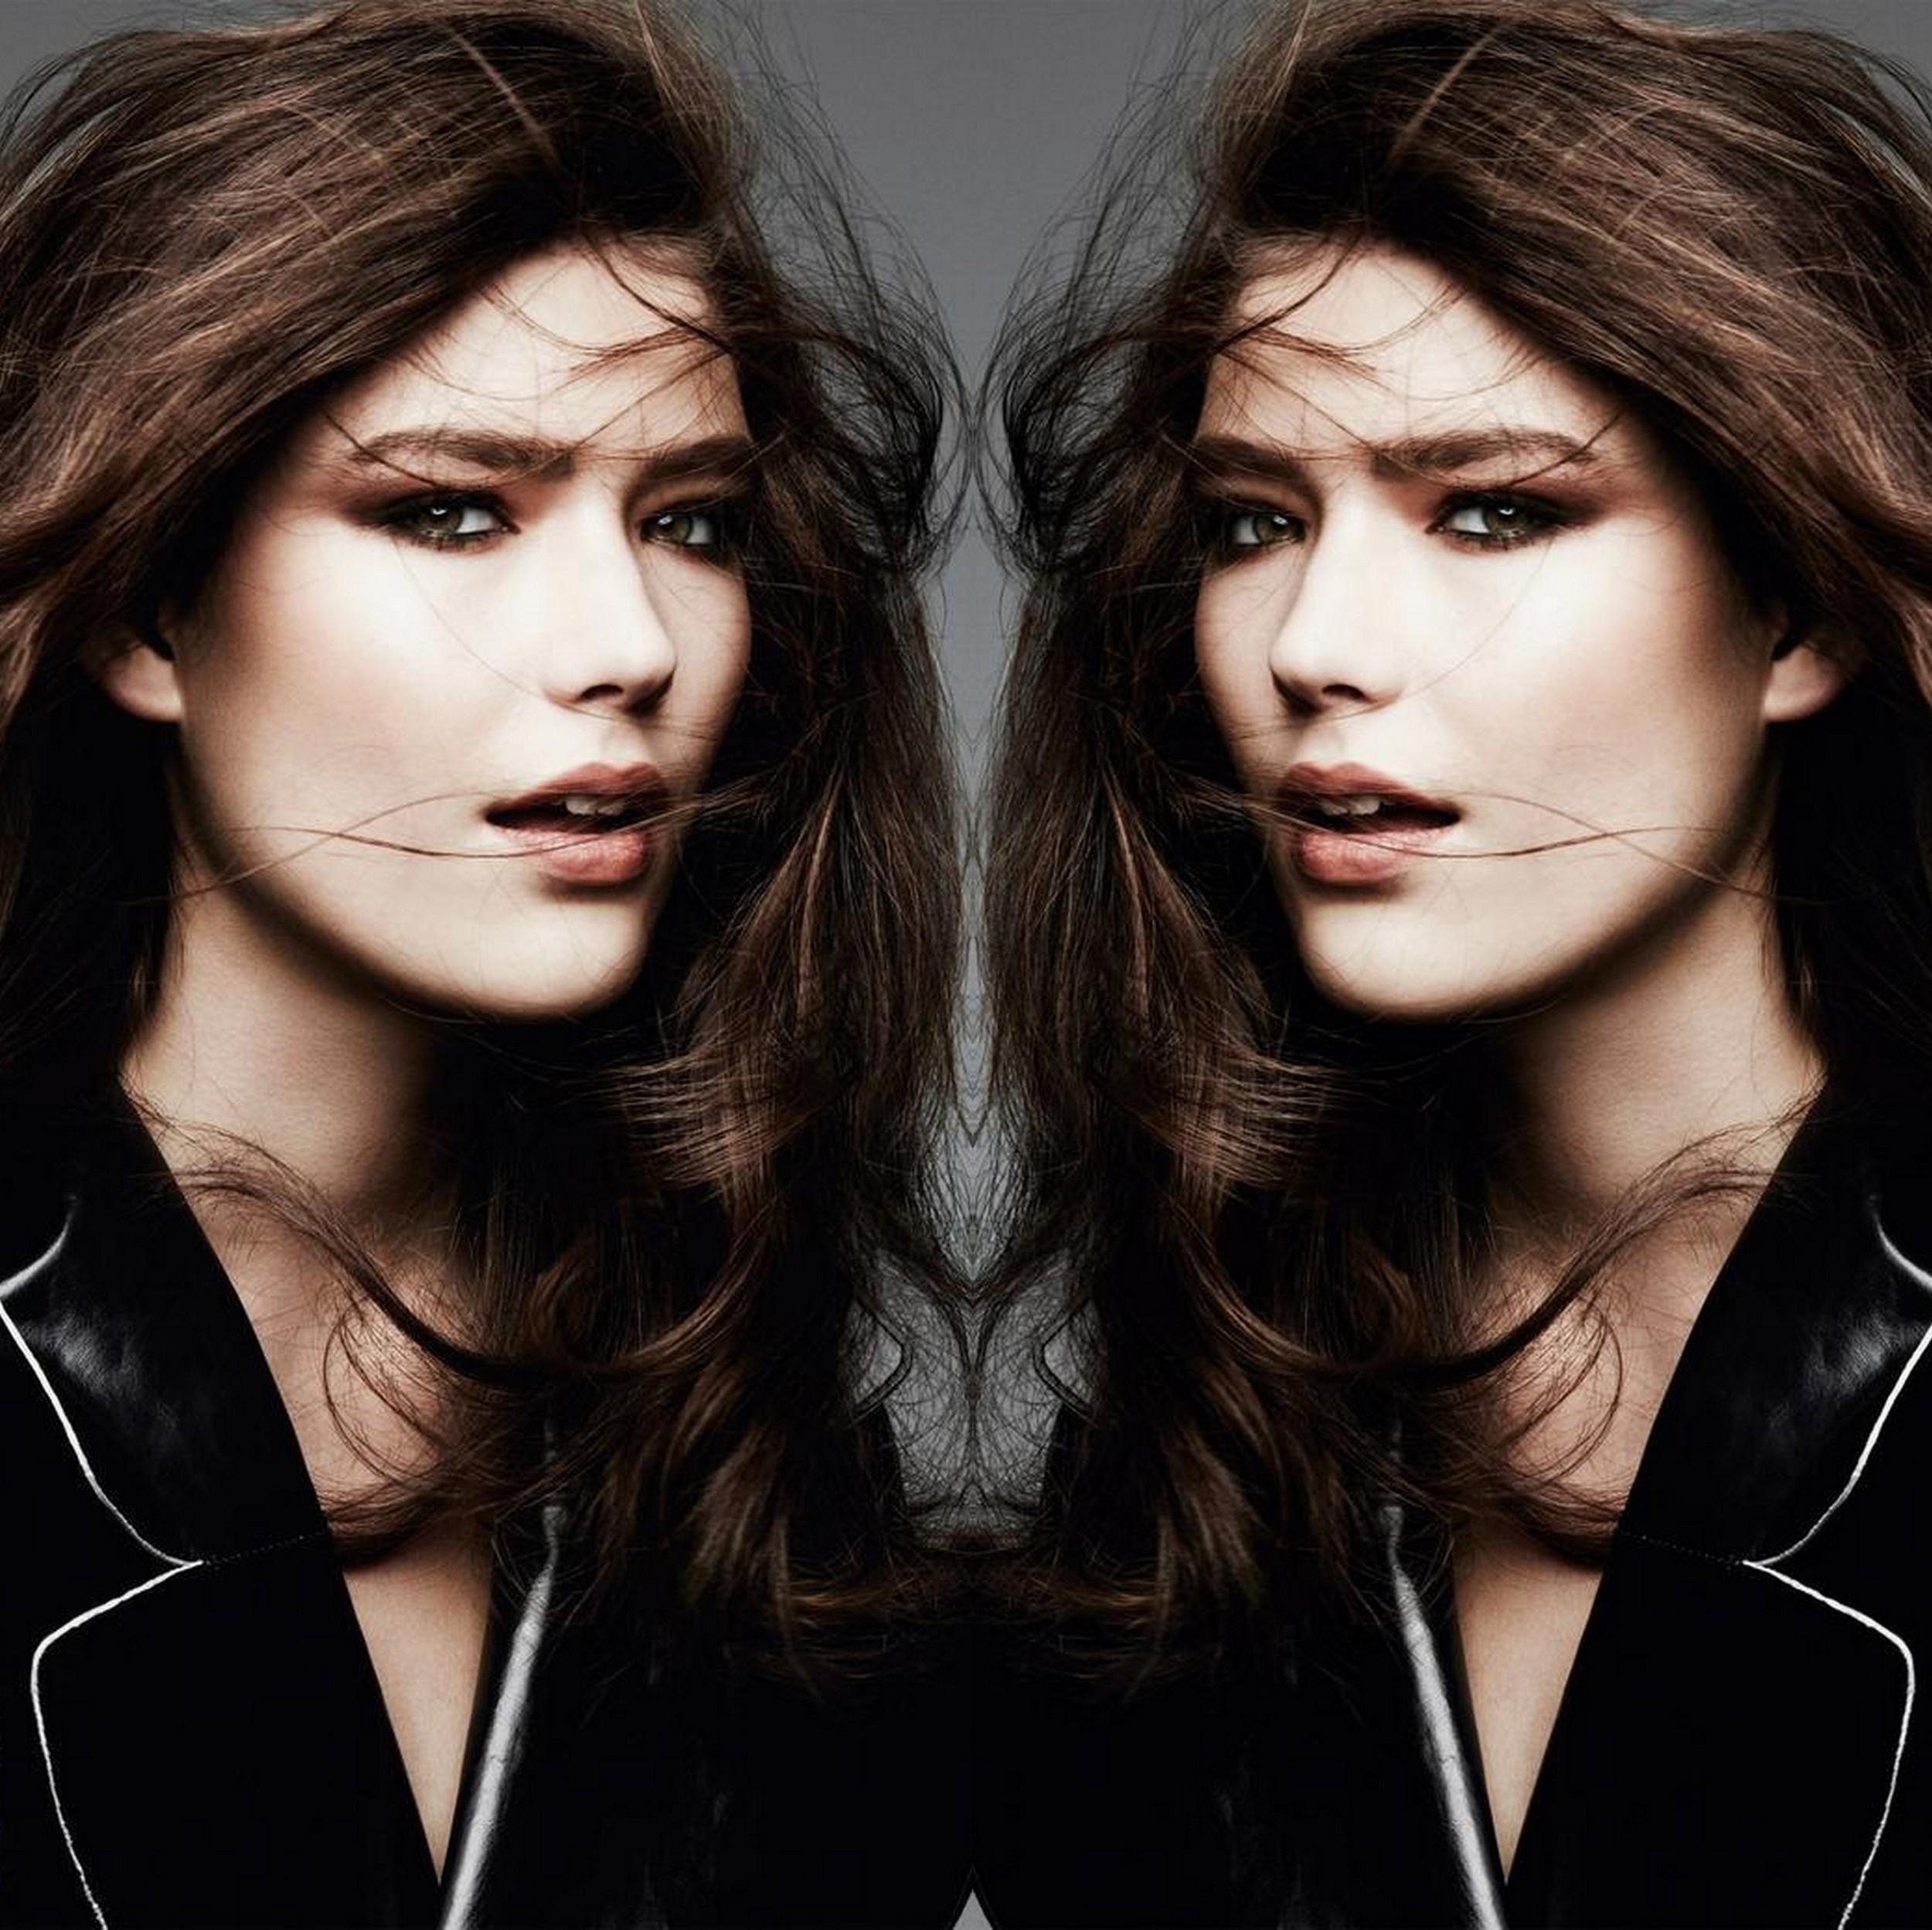 Zuzu Tadeushuk for Vogue Paris by  Ben Hassett , with styling by  Géraldine Saglio , hair by  Rudi Lewis , makeup by  Georgina Graham